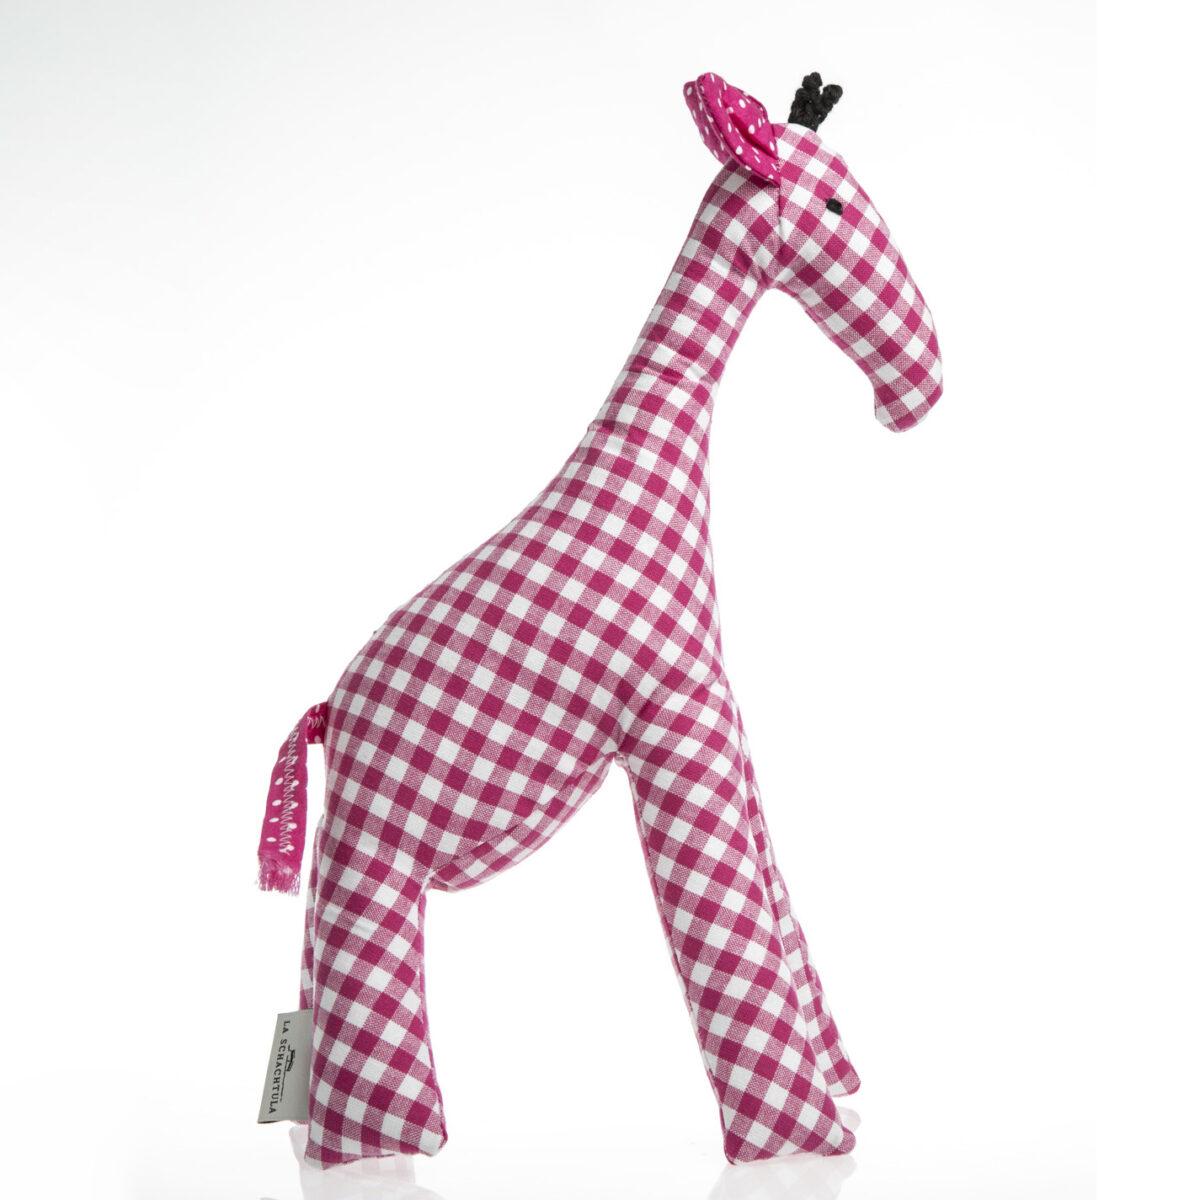 Giraffe rosa